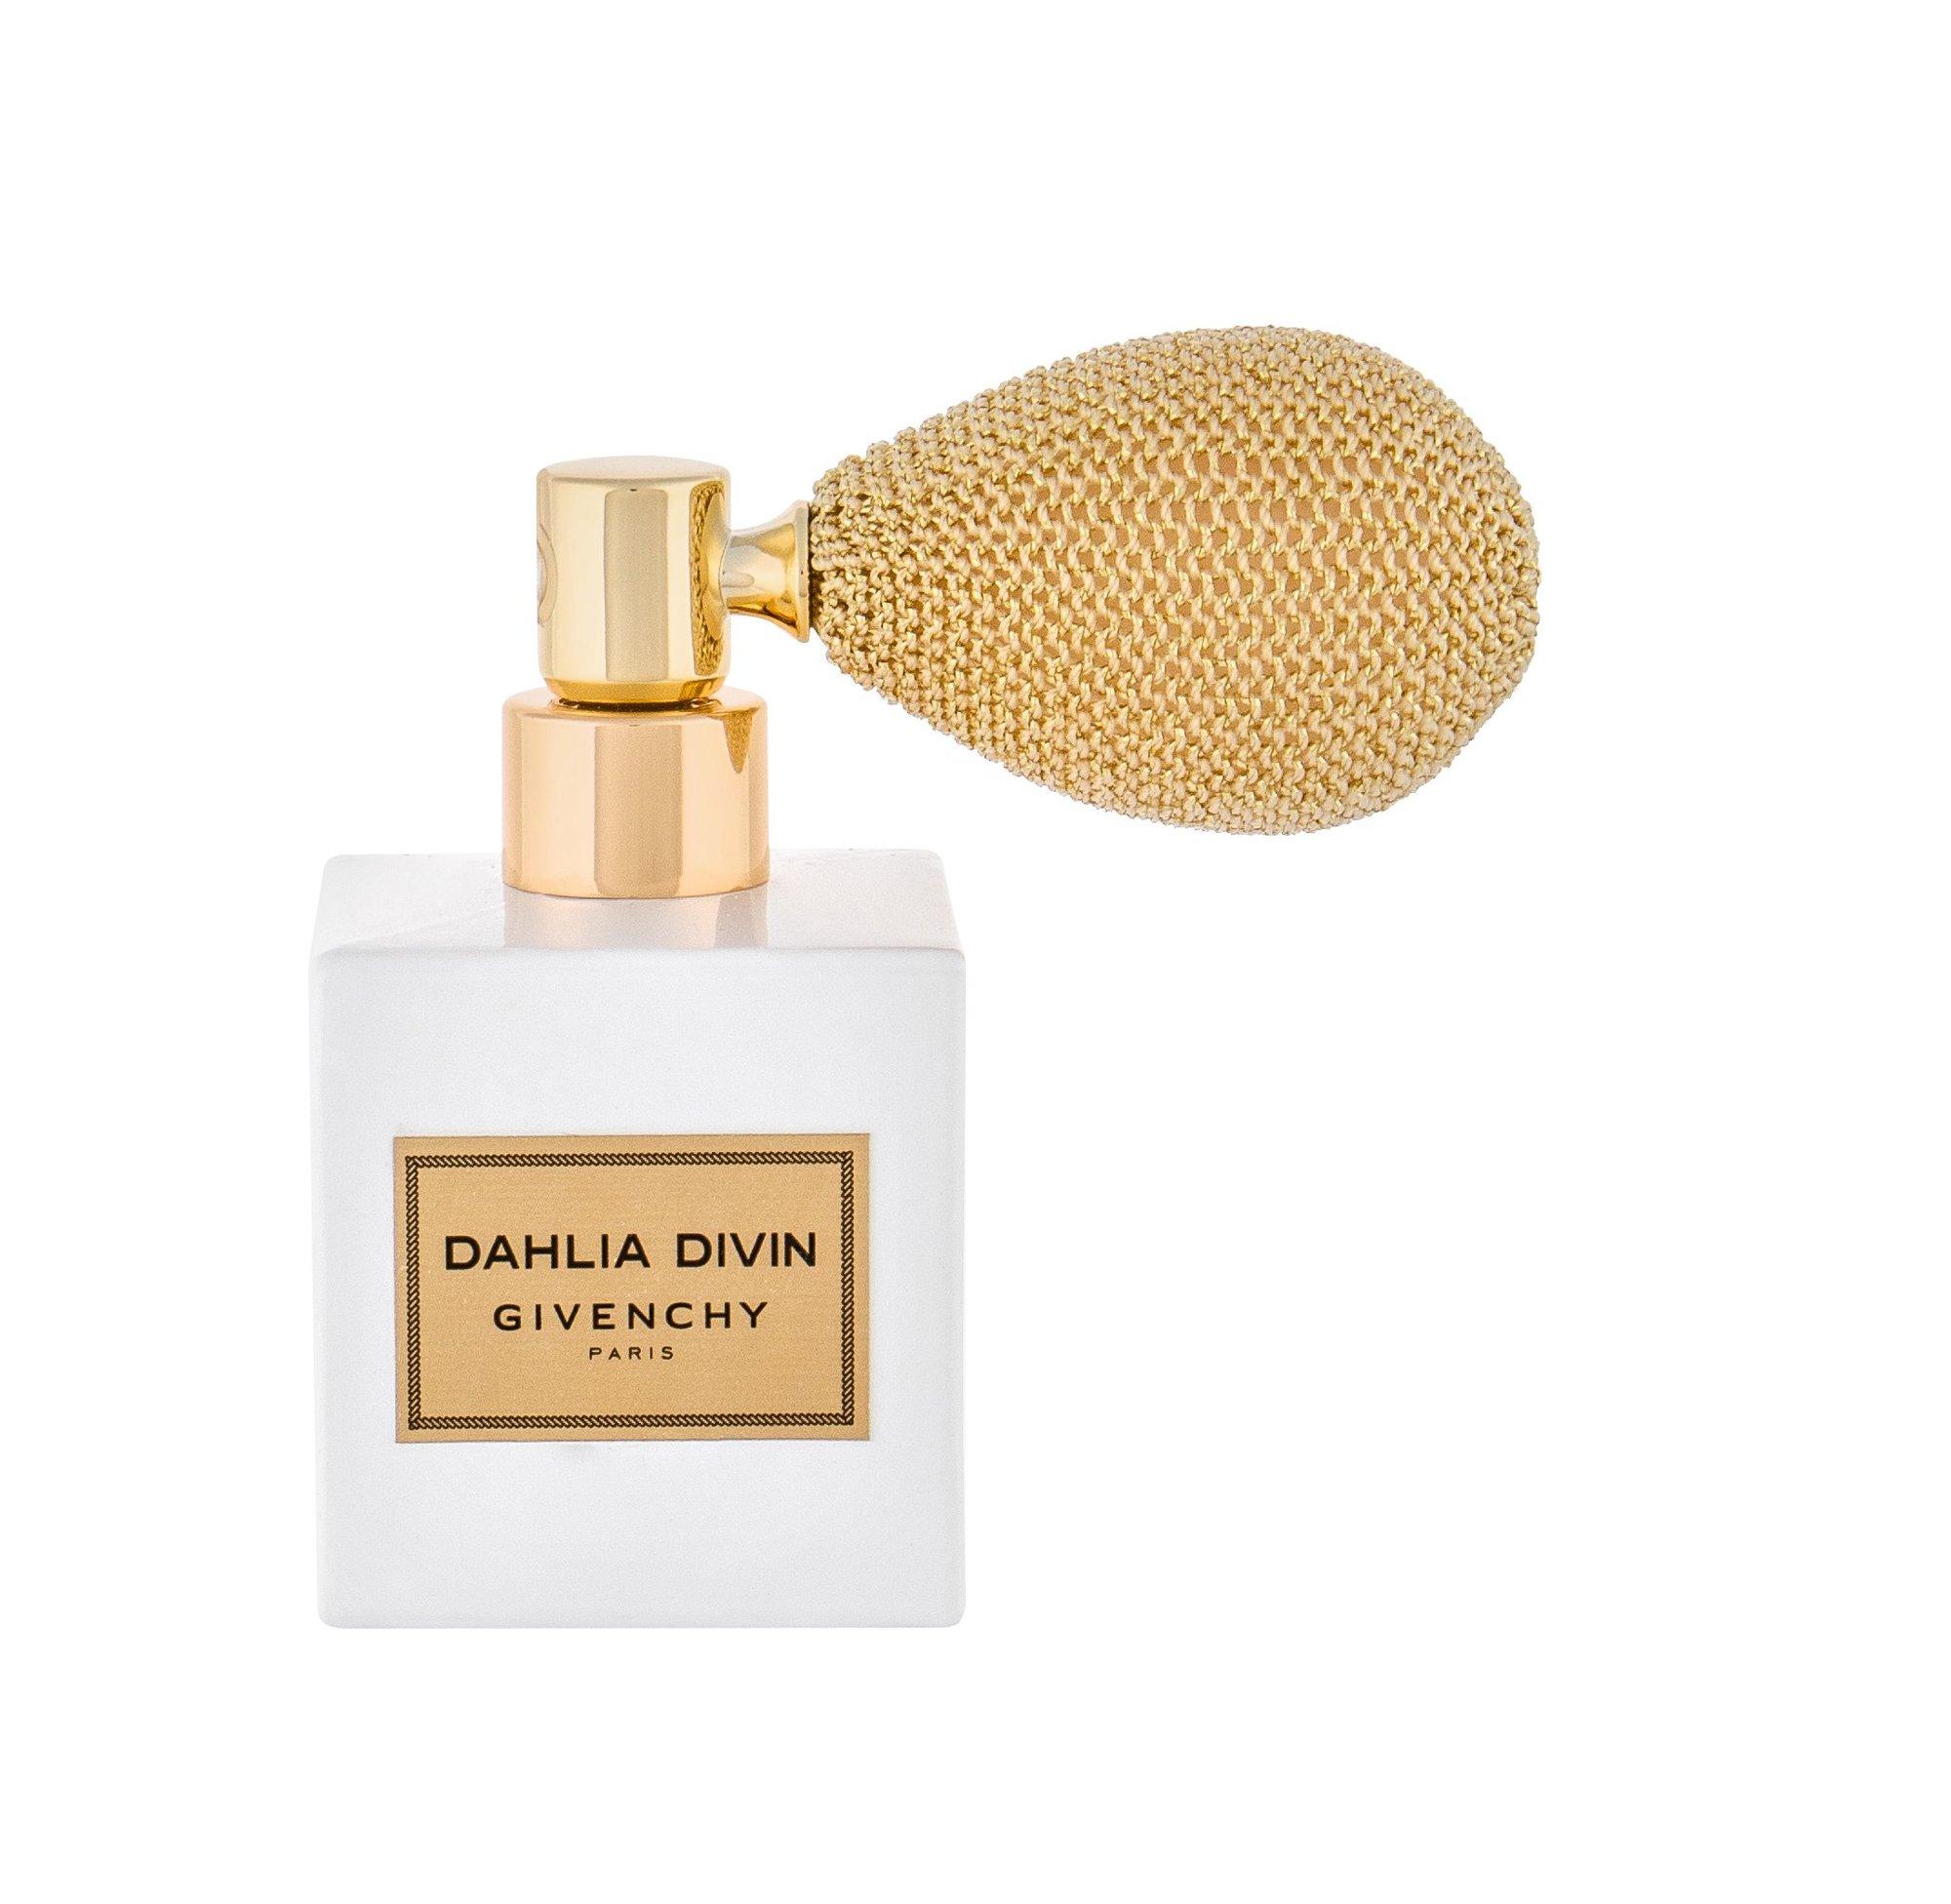 Givenchy Dahlia Divin Body Powder 9ml